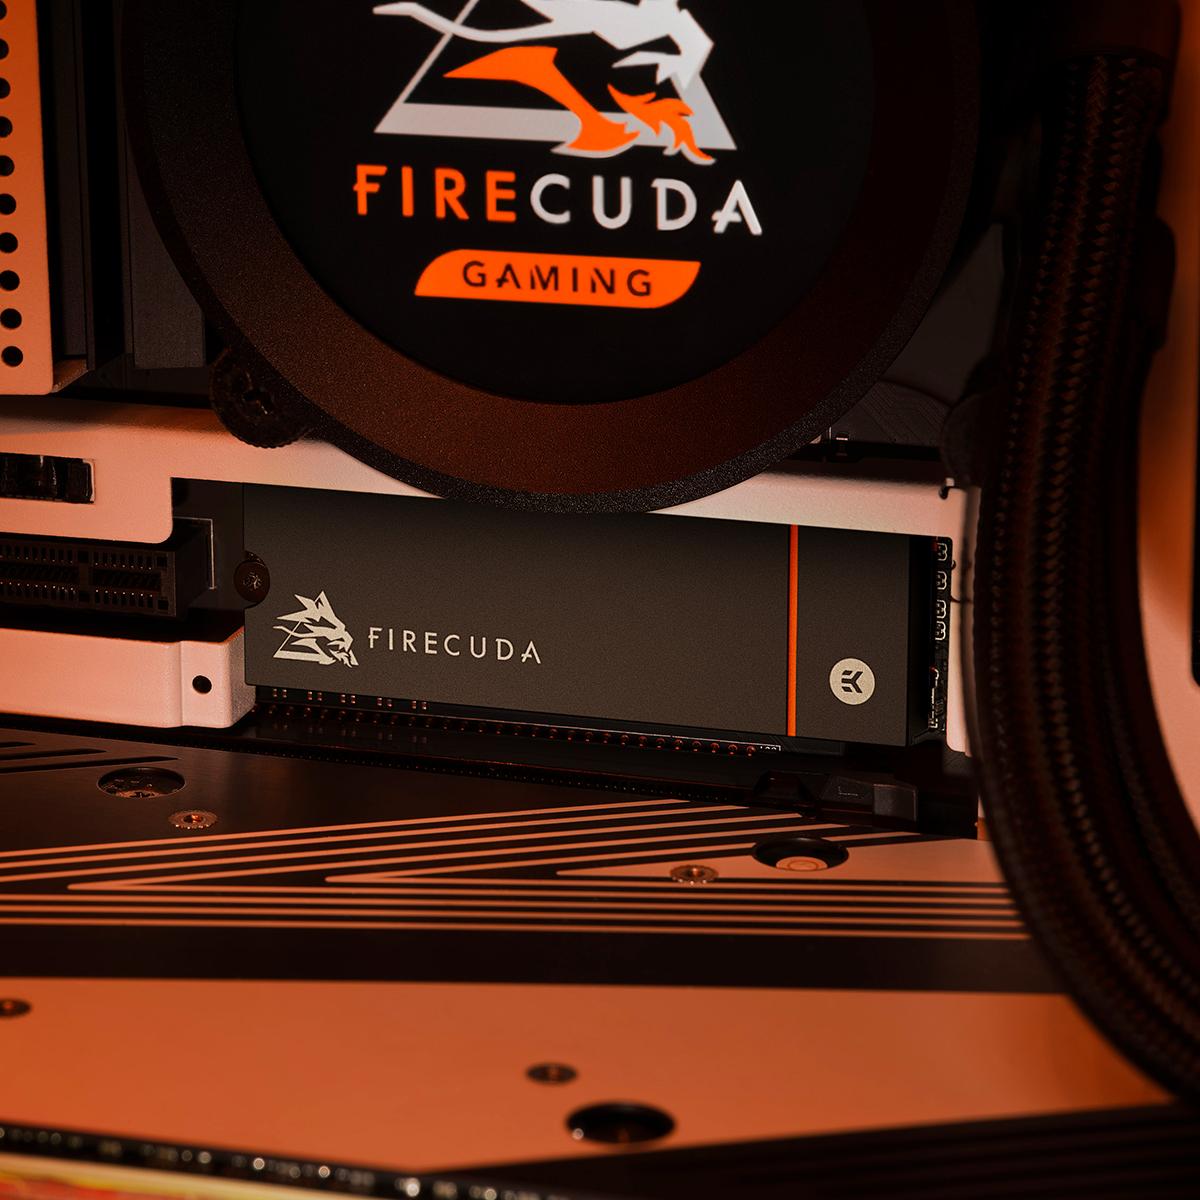 EK_SSD_Firecuda_with_heatsink_4